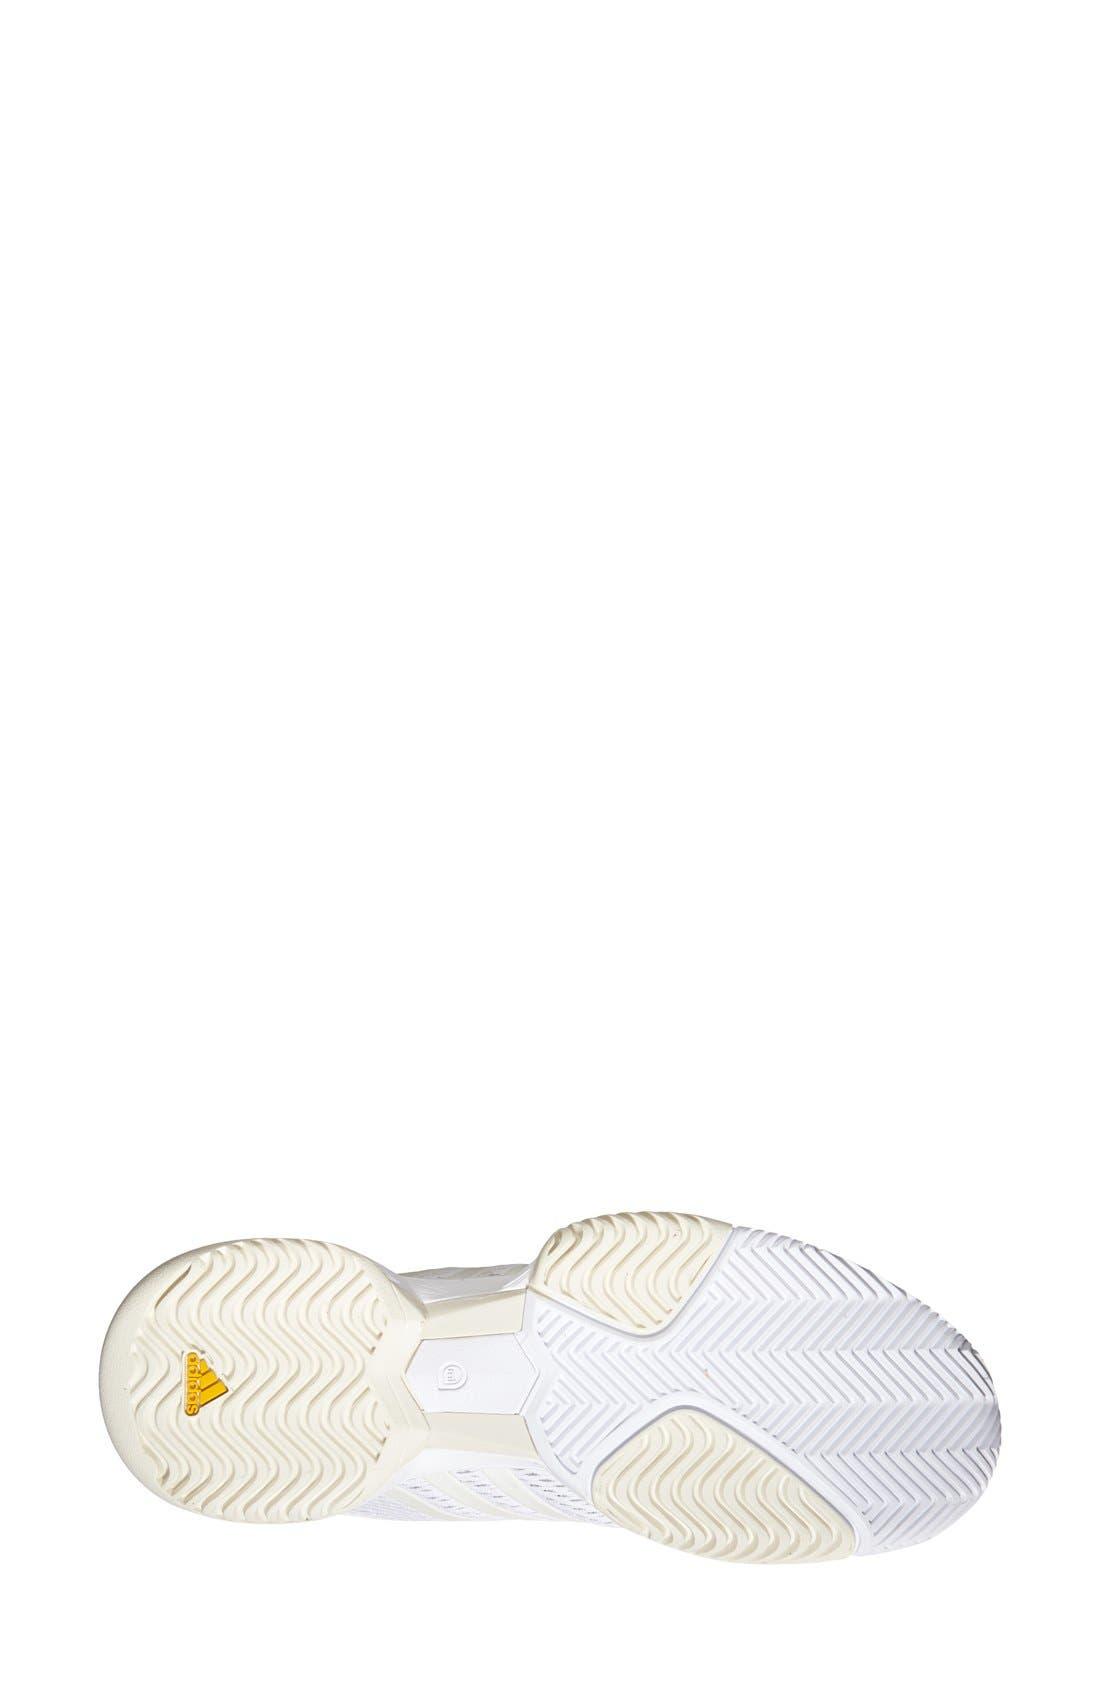 Alternate Image 4  - adidas 'Stella McCartney - Barricade 2015' Tennis Shoe (Women)